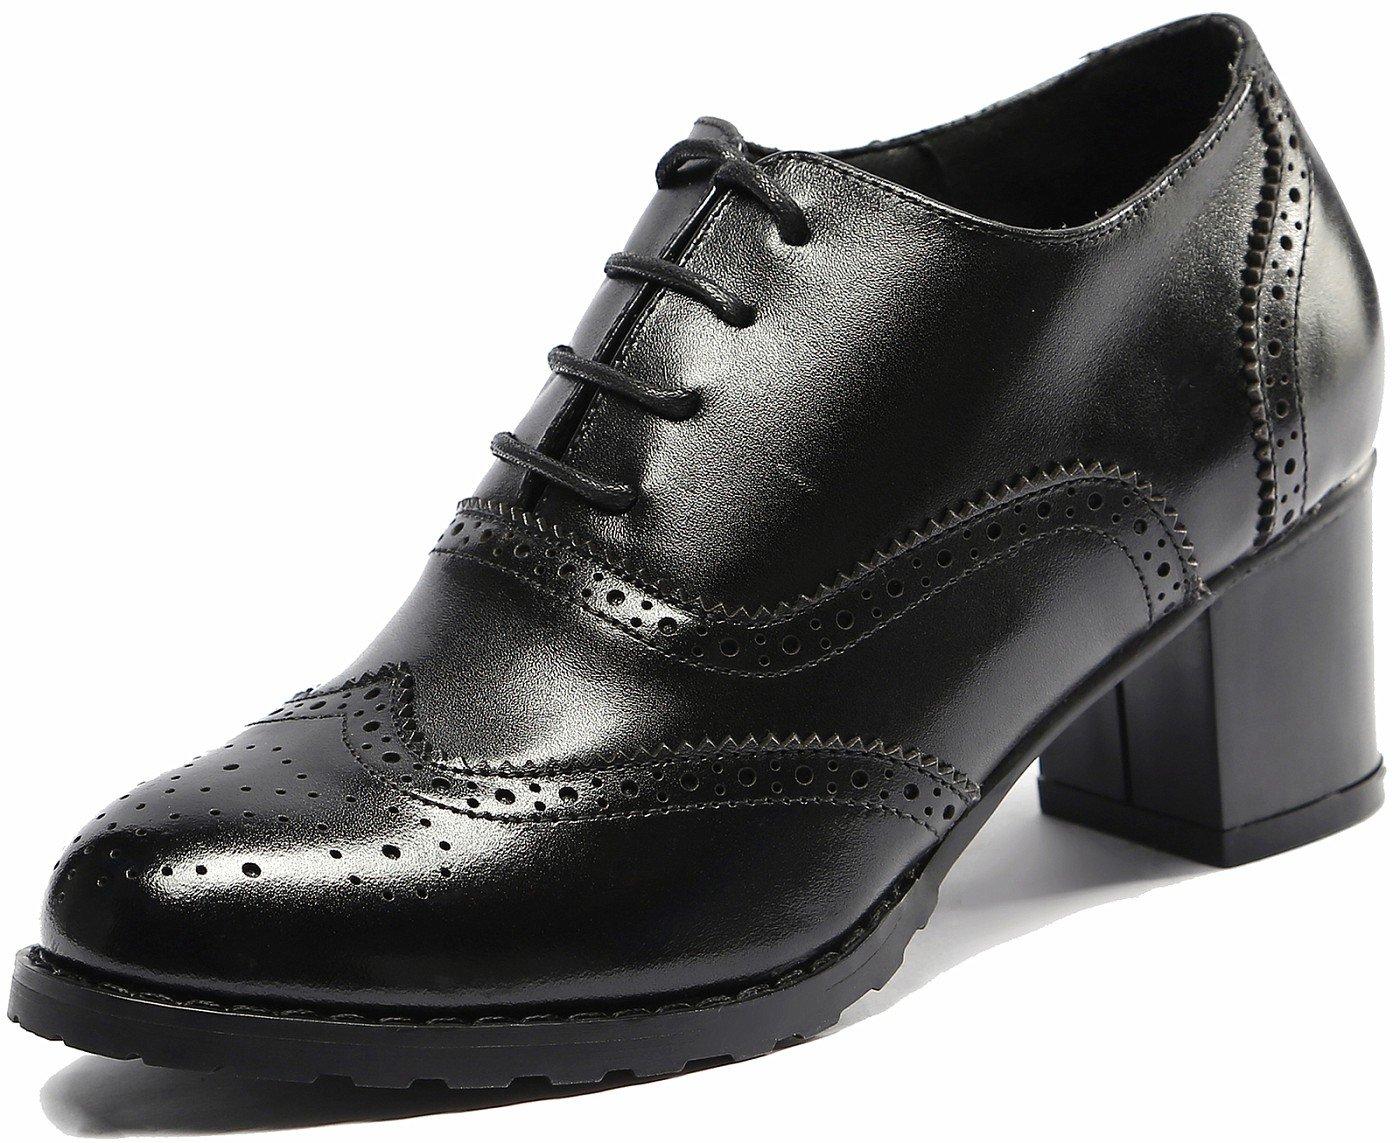 U-lite Black Perforated Lace-up Wingtip Leather Pump Oxfords Vintage Oxford Shoe Women BLK 8